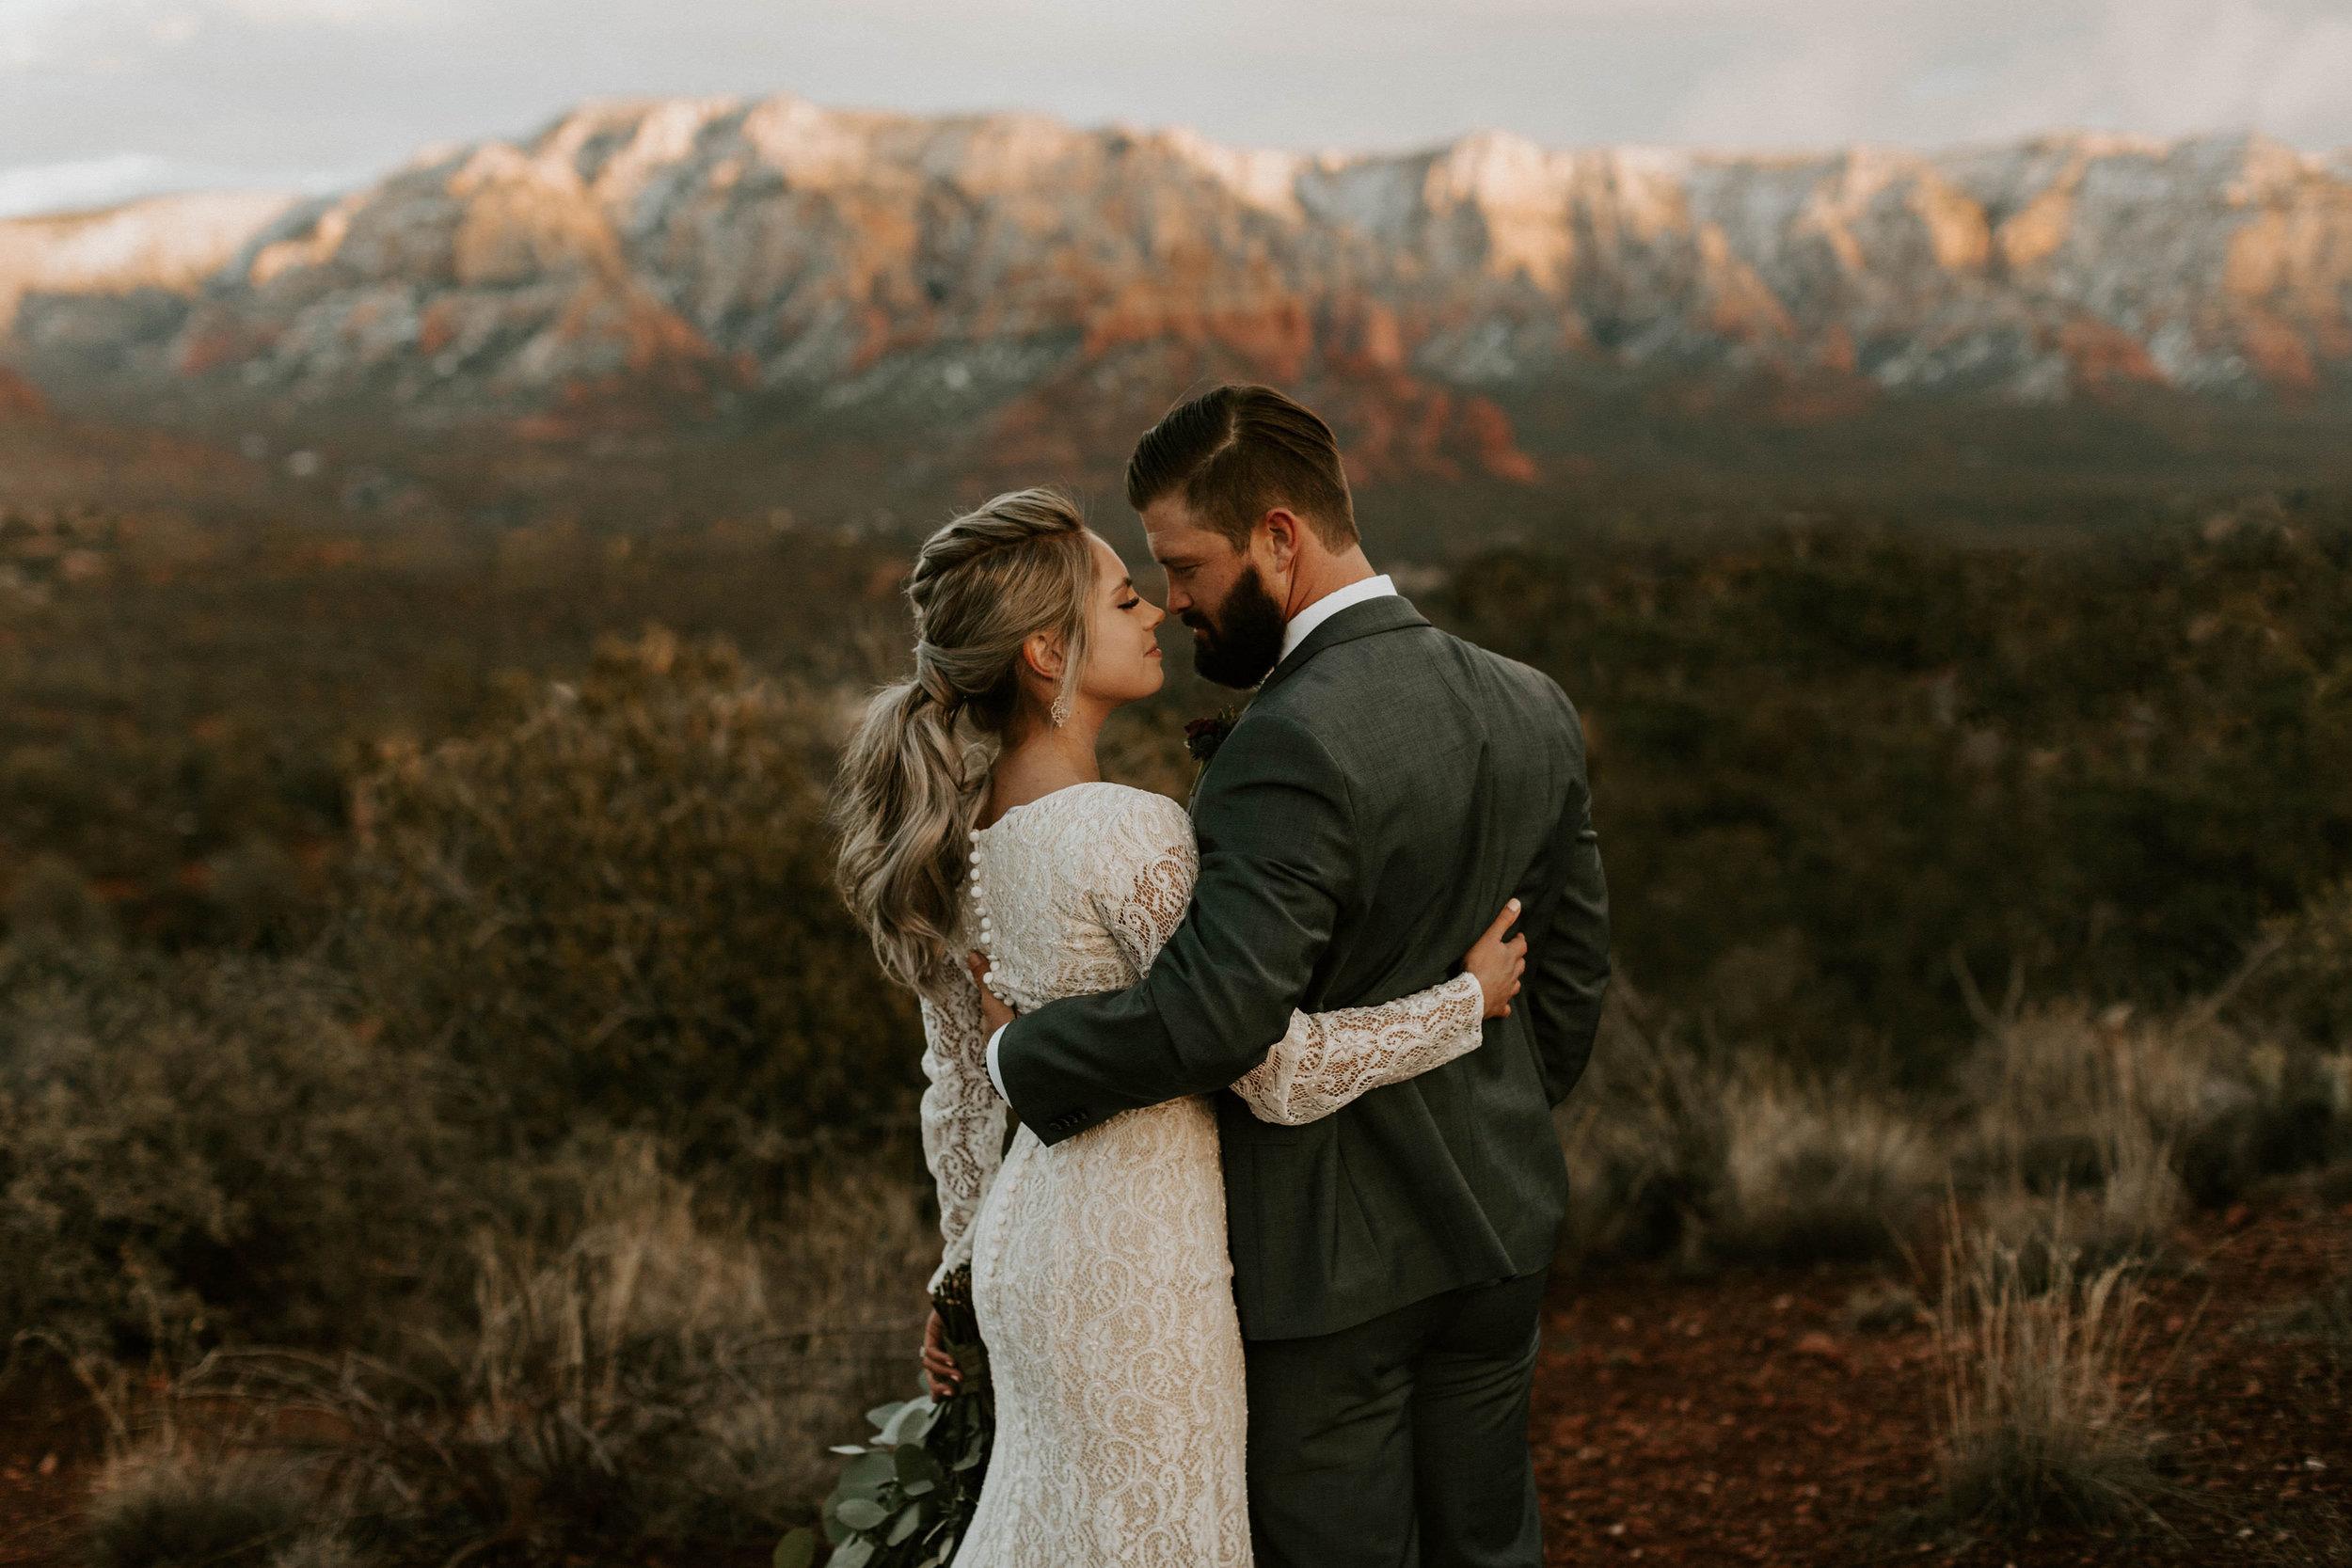 Snowy Sedona Arizona Wedding Photos